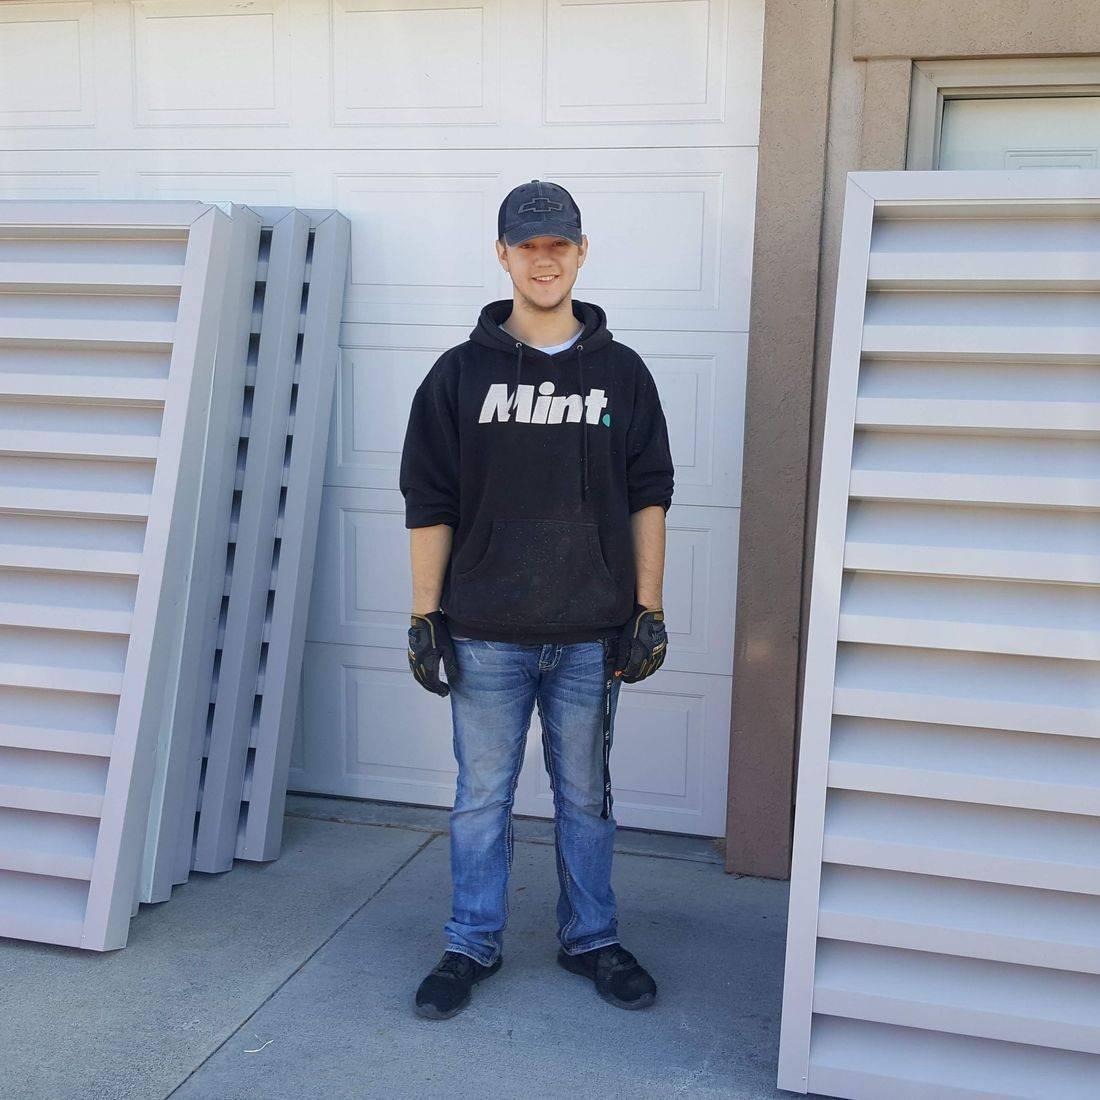 Large aluminum gable louvers